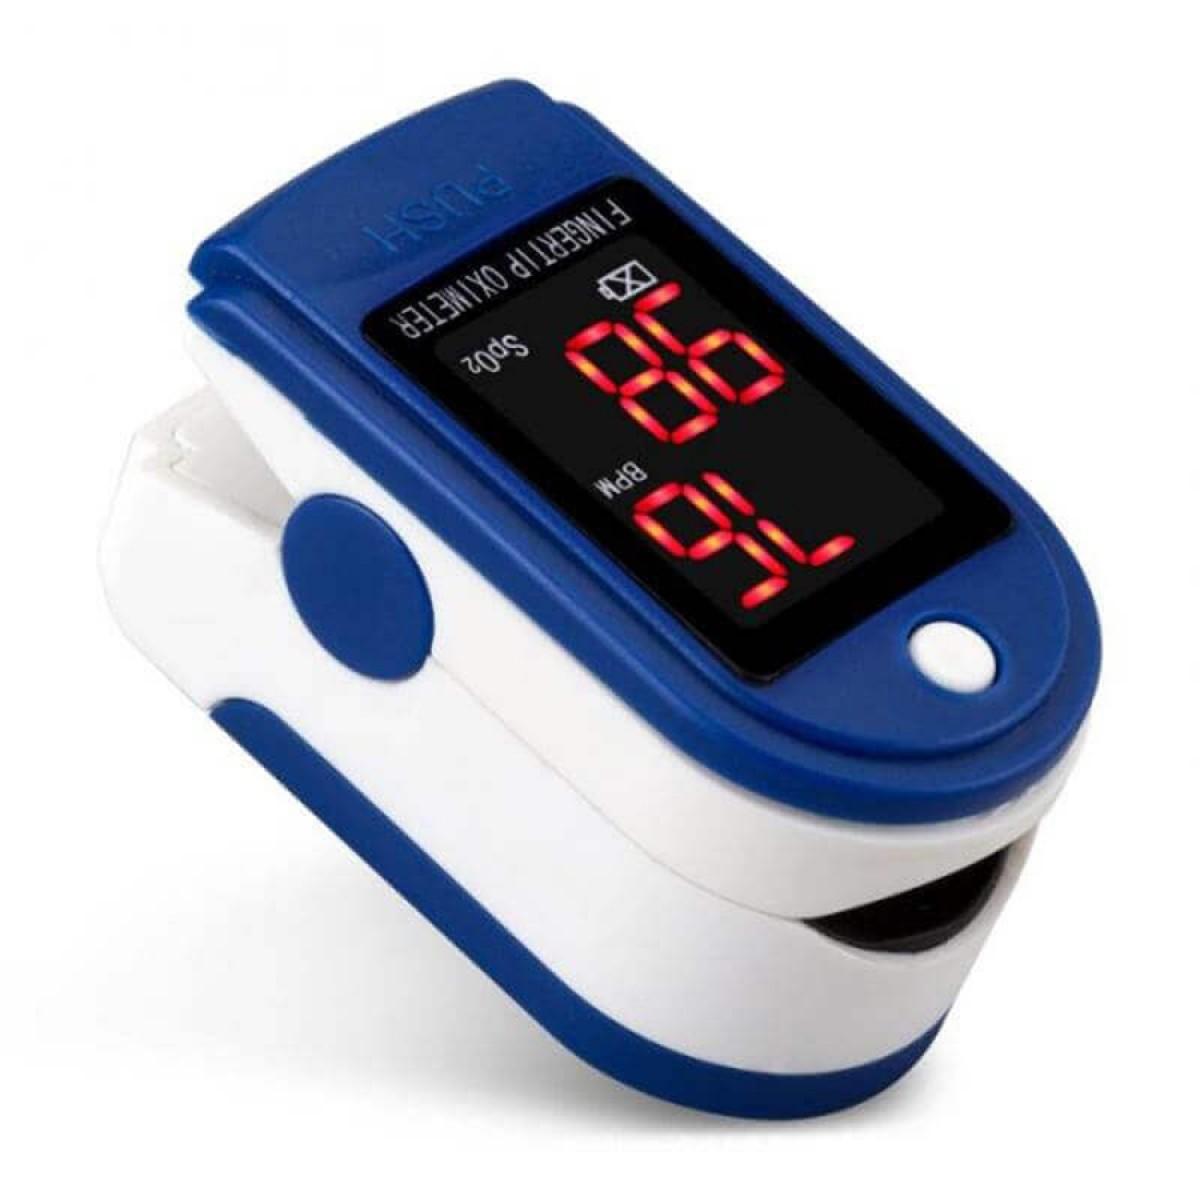 Oximeter JKZ 302 OLED Display - Οξύμετρο δακτύλου παλμικό